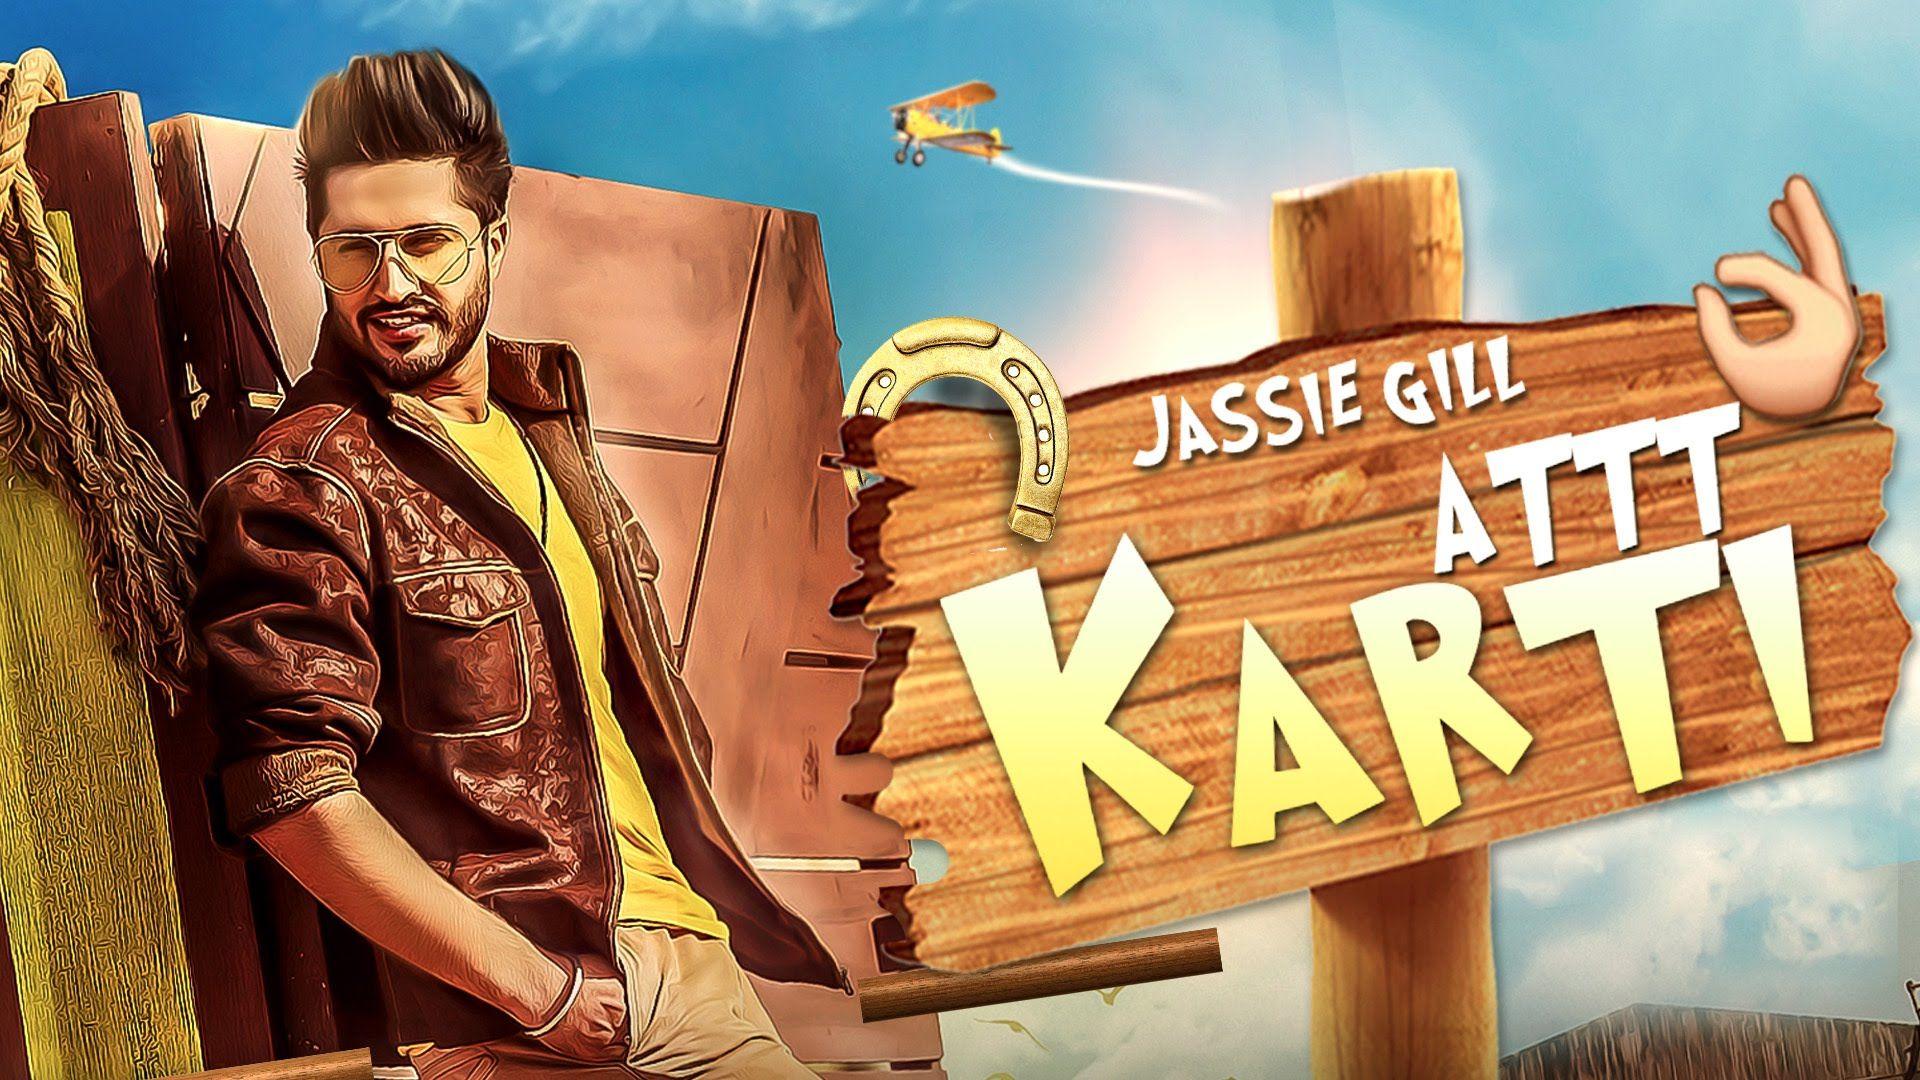 Attt karti full song jassi gill desi crew latest punjabi songs